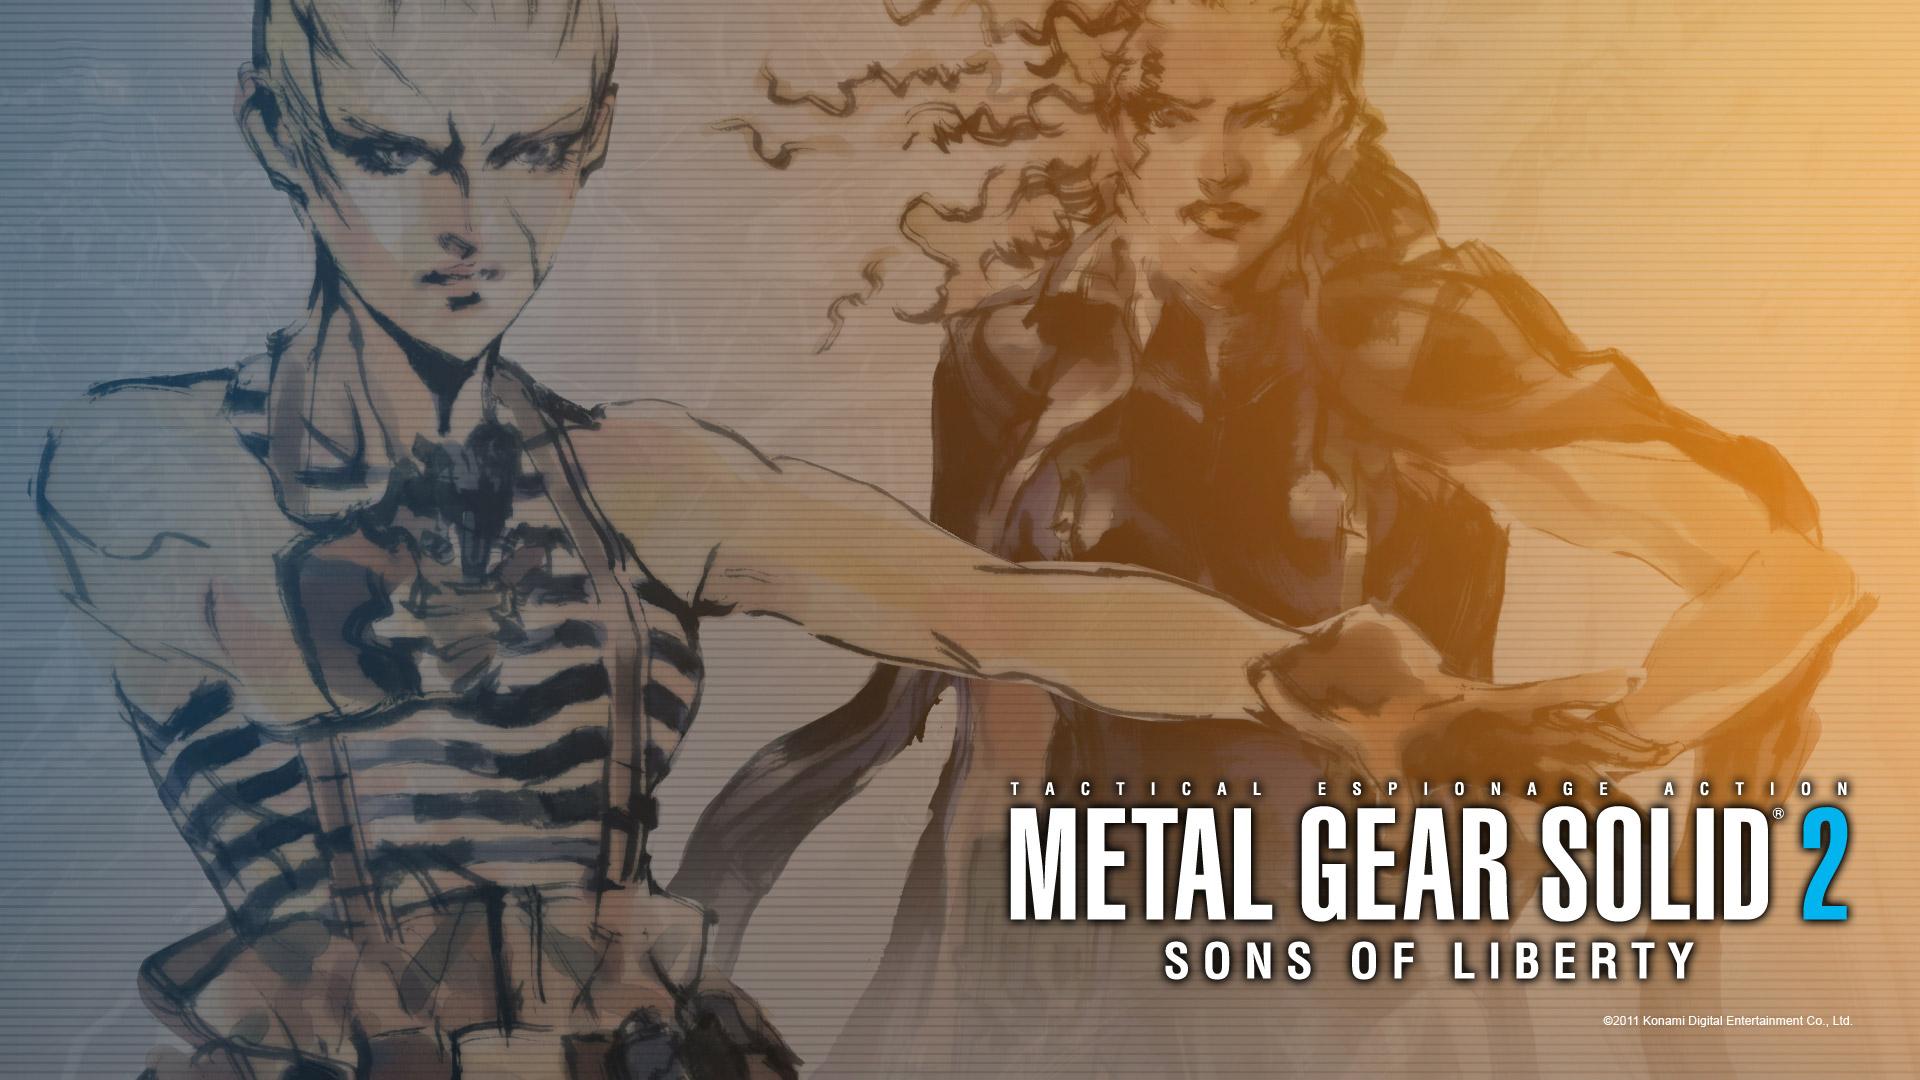 Free Metal Gear Solid 2 Wallpaper in 1920x1080